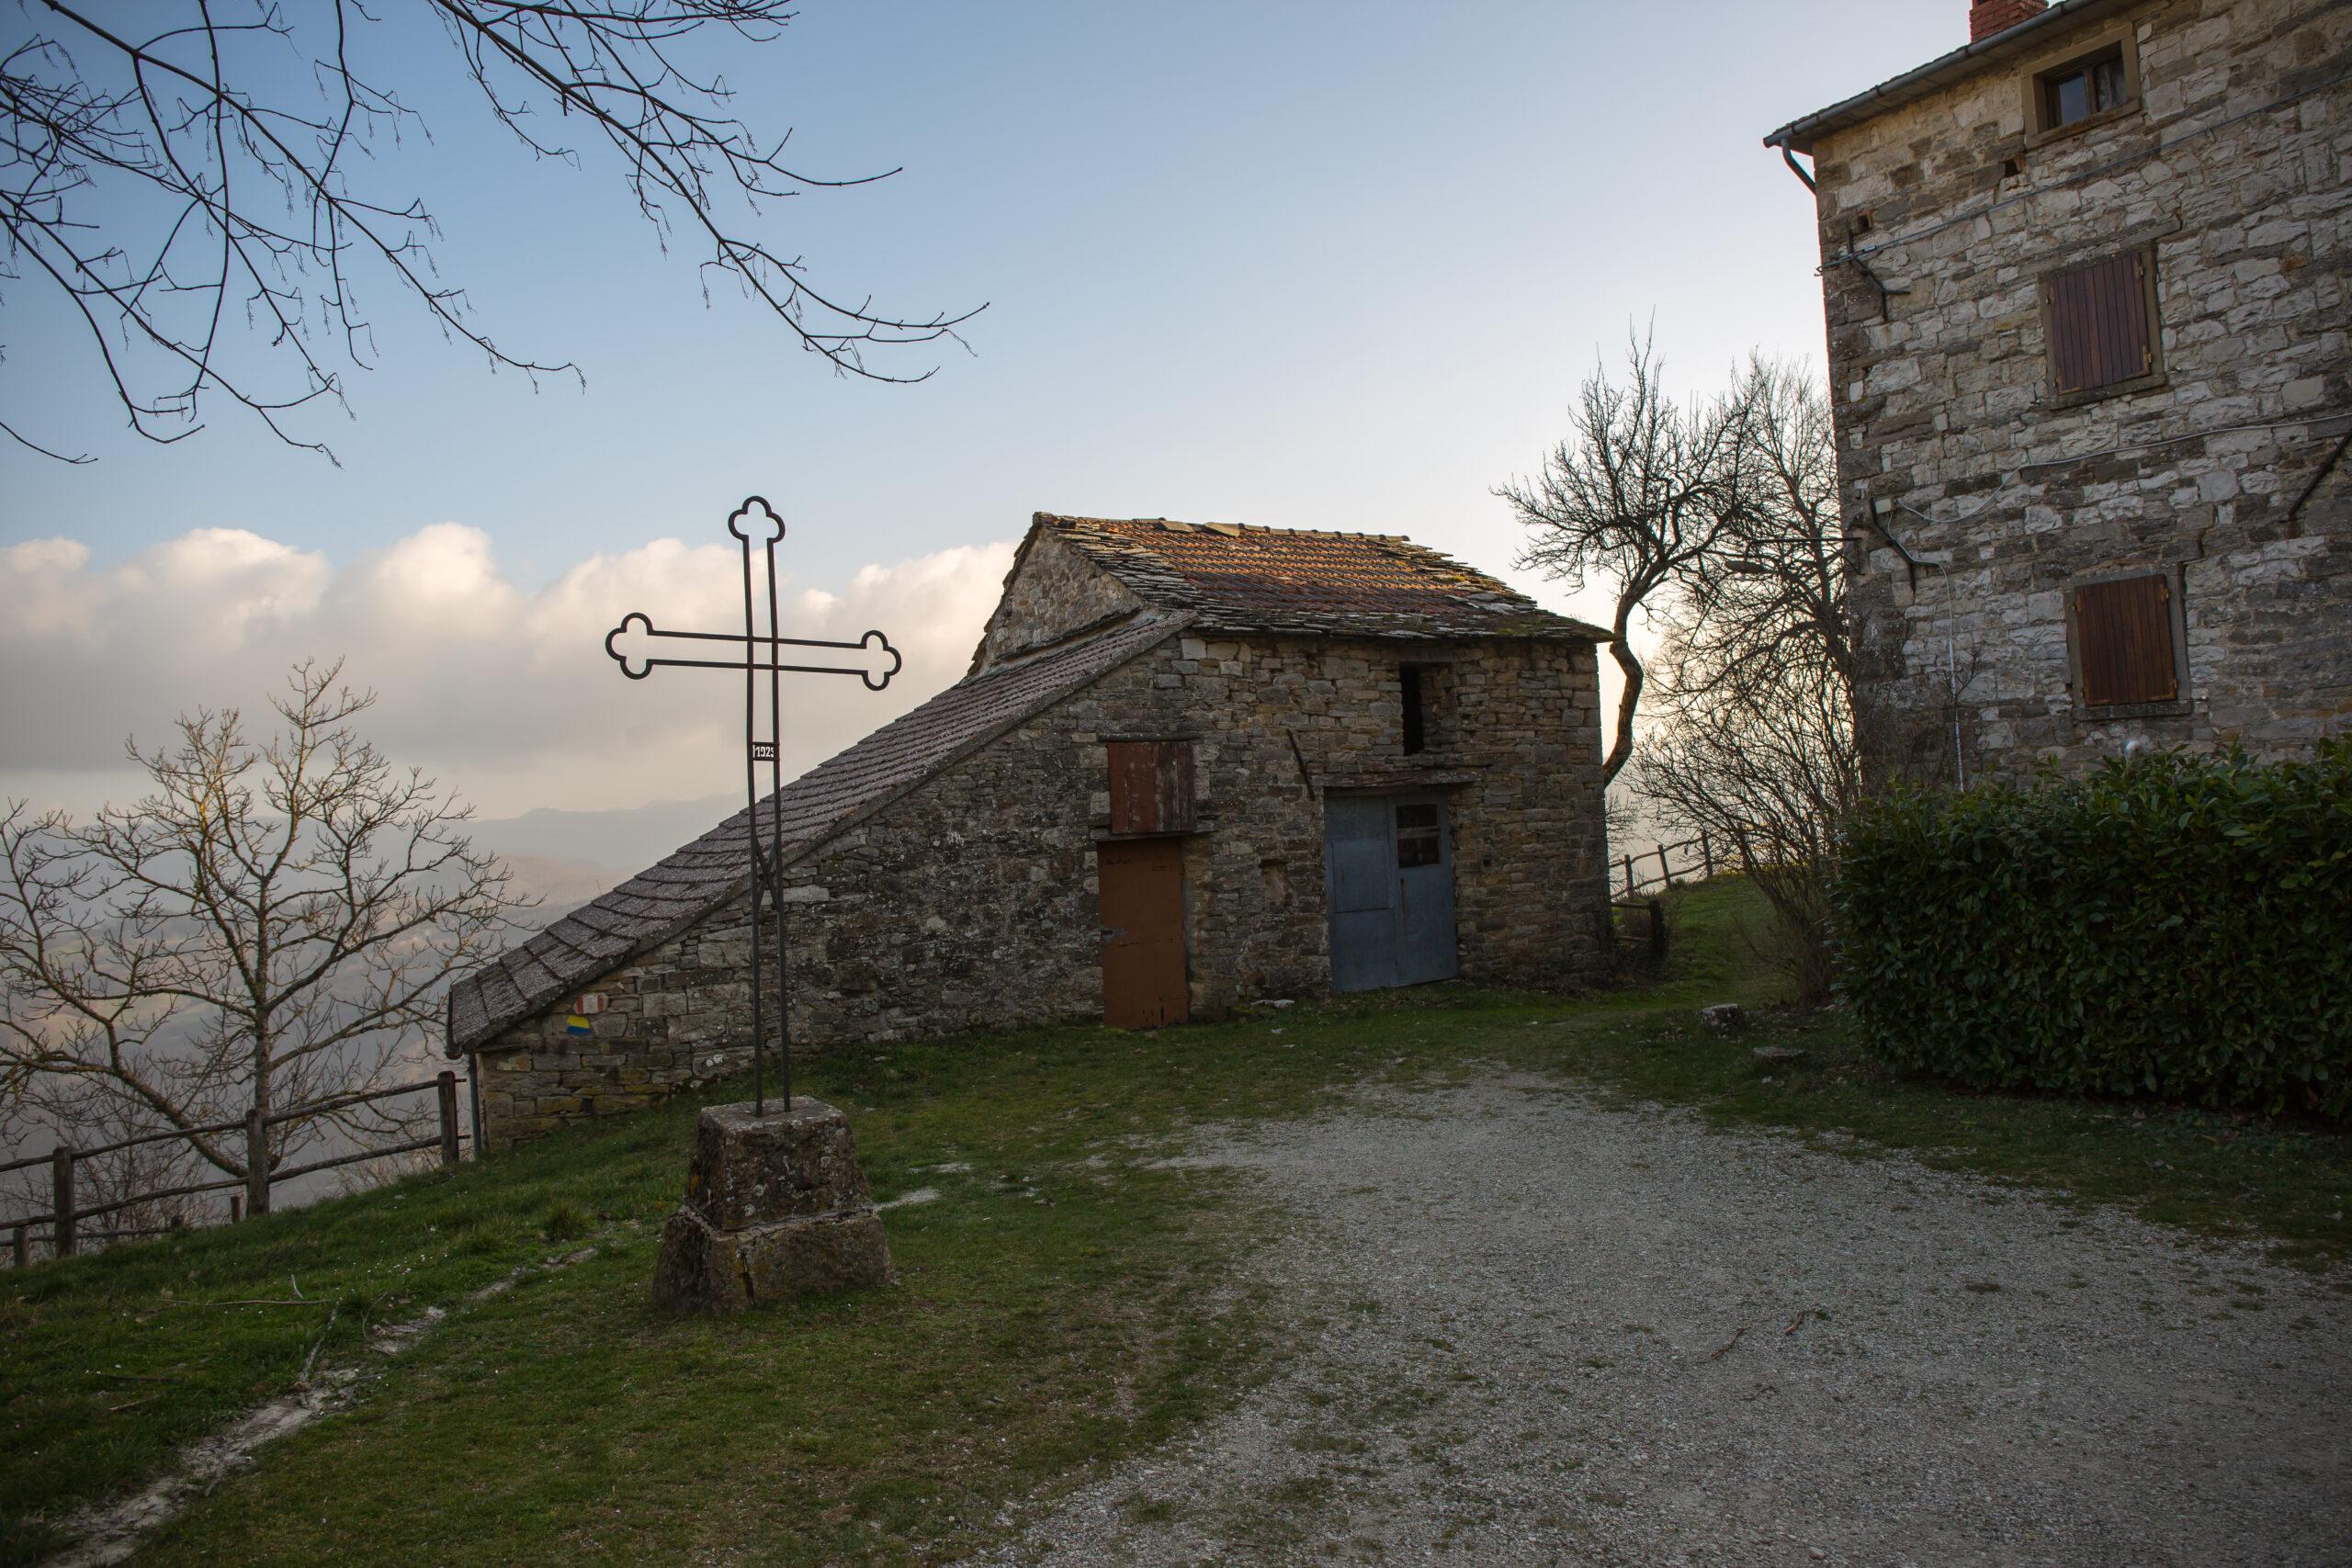 montebotolino-badia-tedalda-arezzo